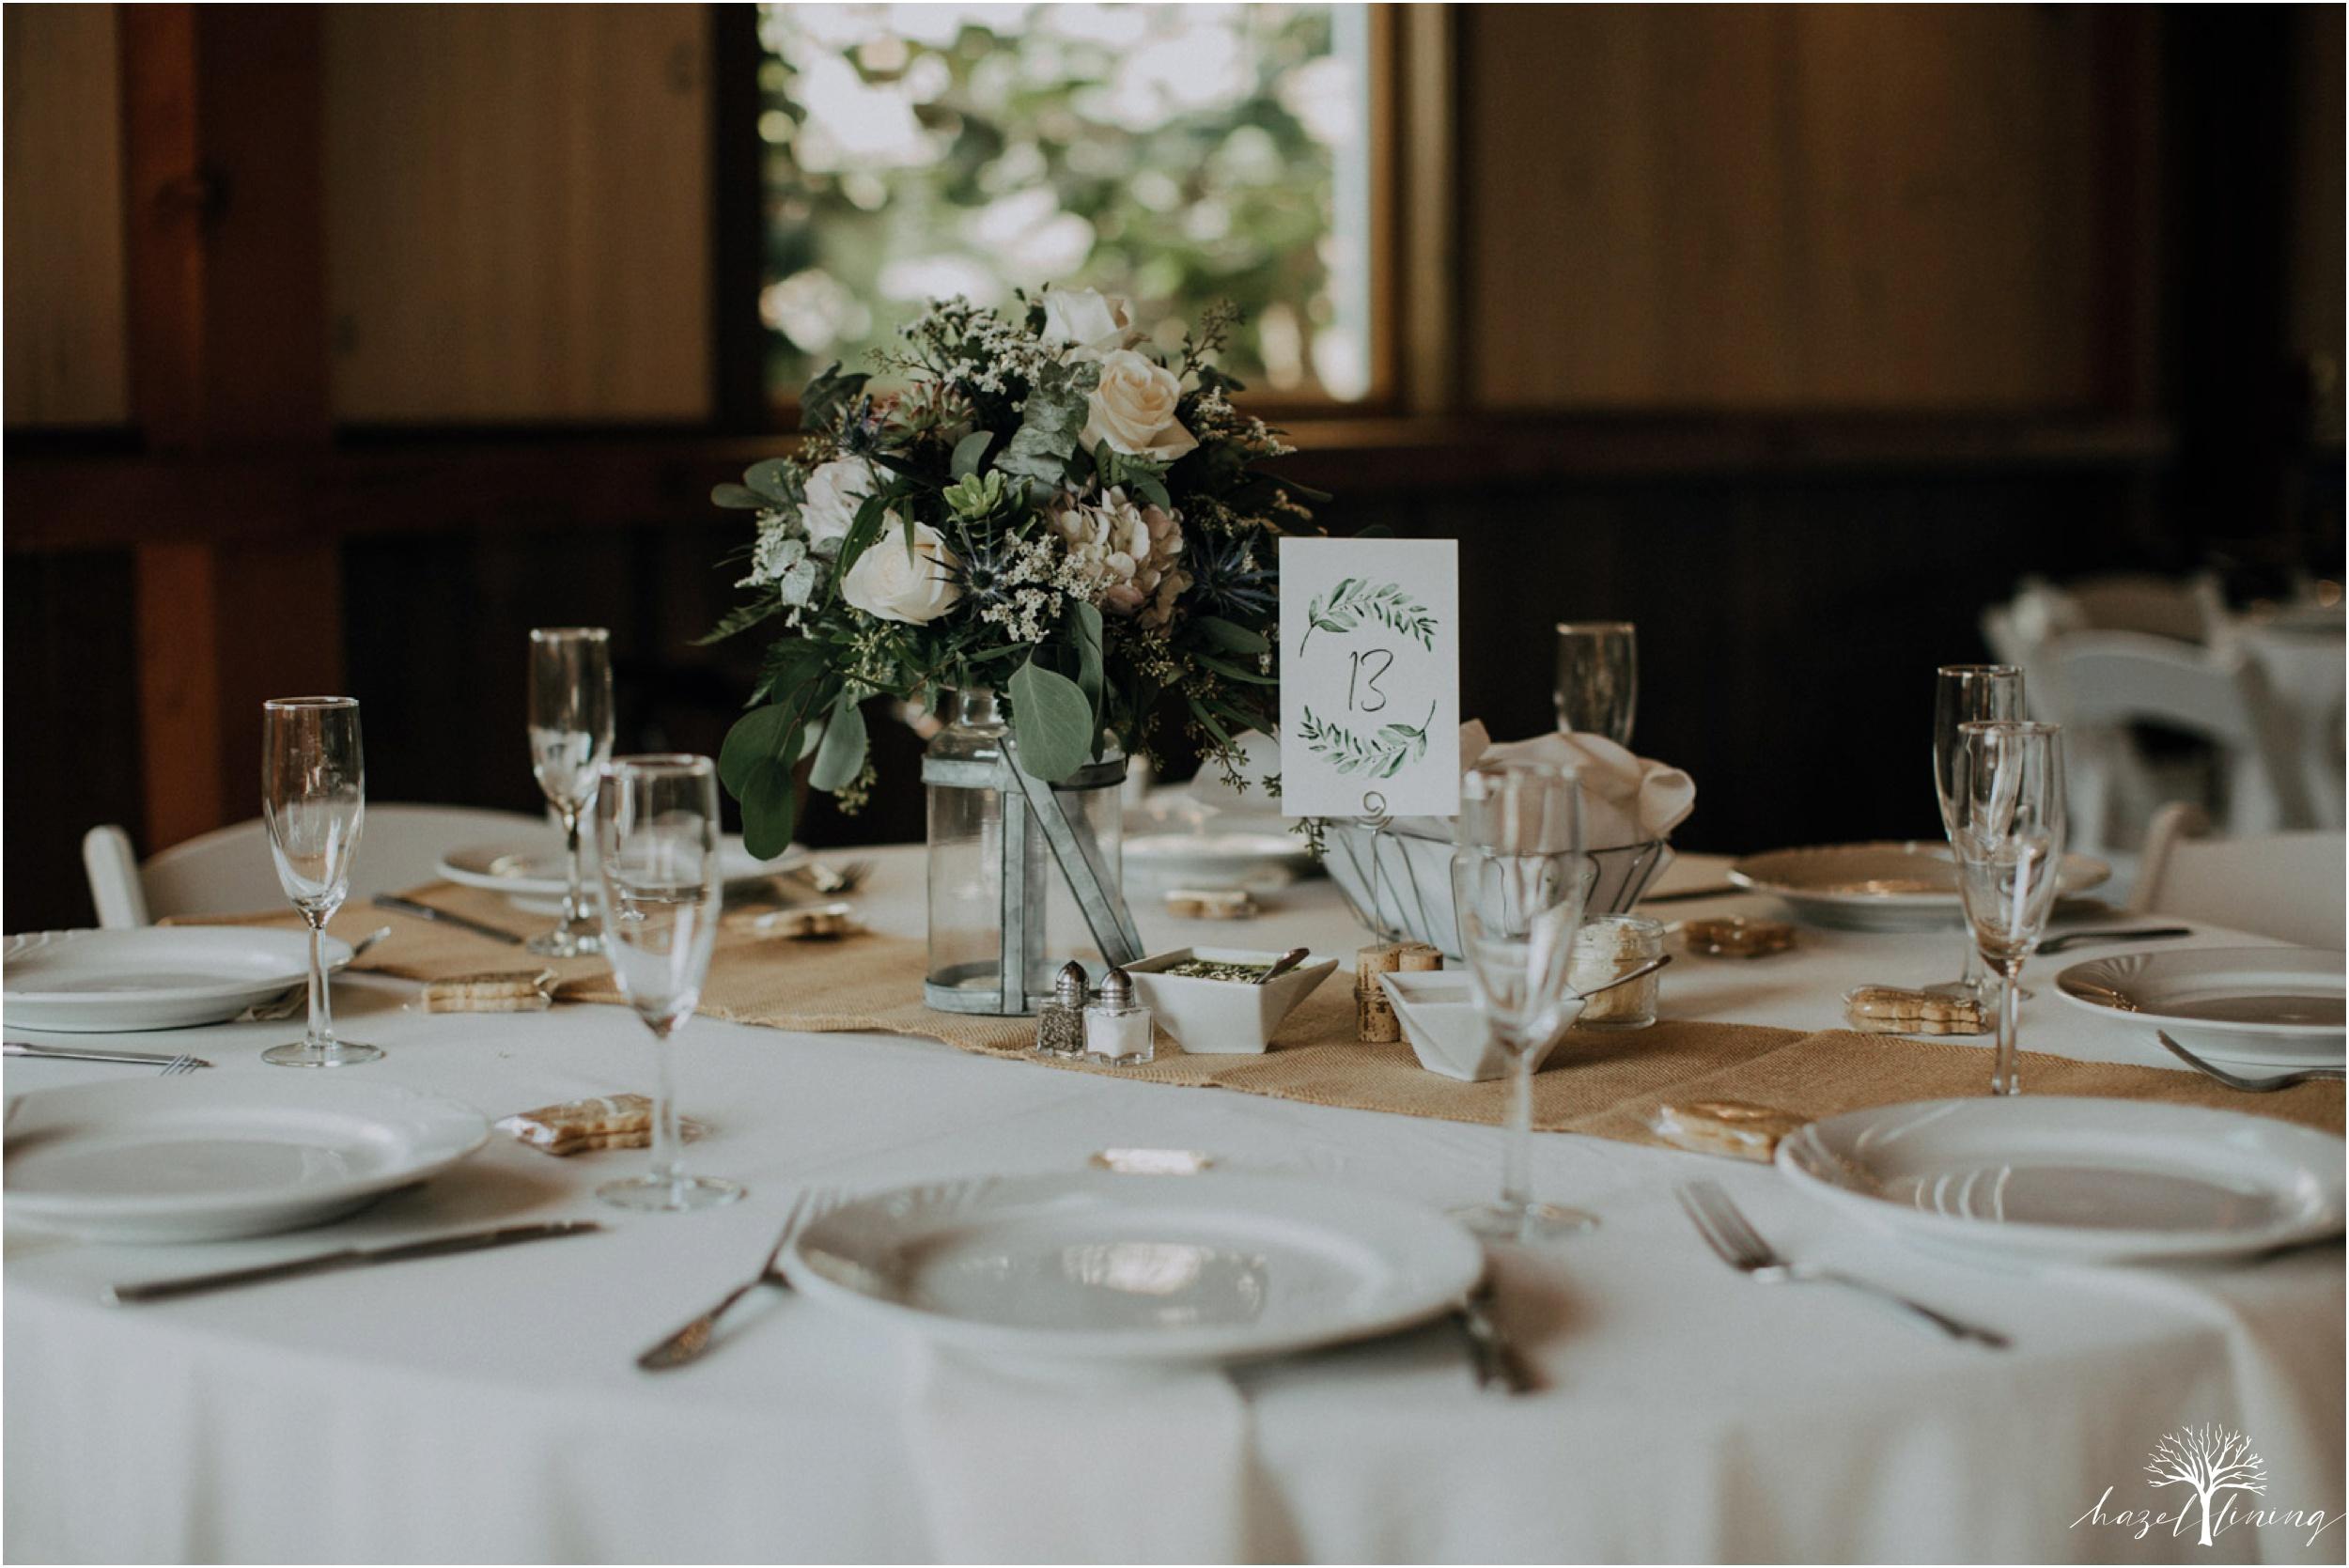 maureen-hepner-anthony-giordano-rose-bank-winery-newtow-pennsylvania-luxury-summer-wedding-hazel-lining-photography-destination-elopement-wedding-engagement-photography_0126.jpg